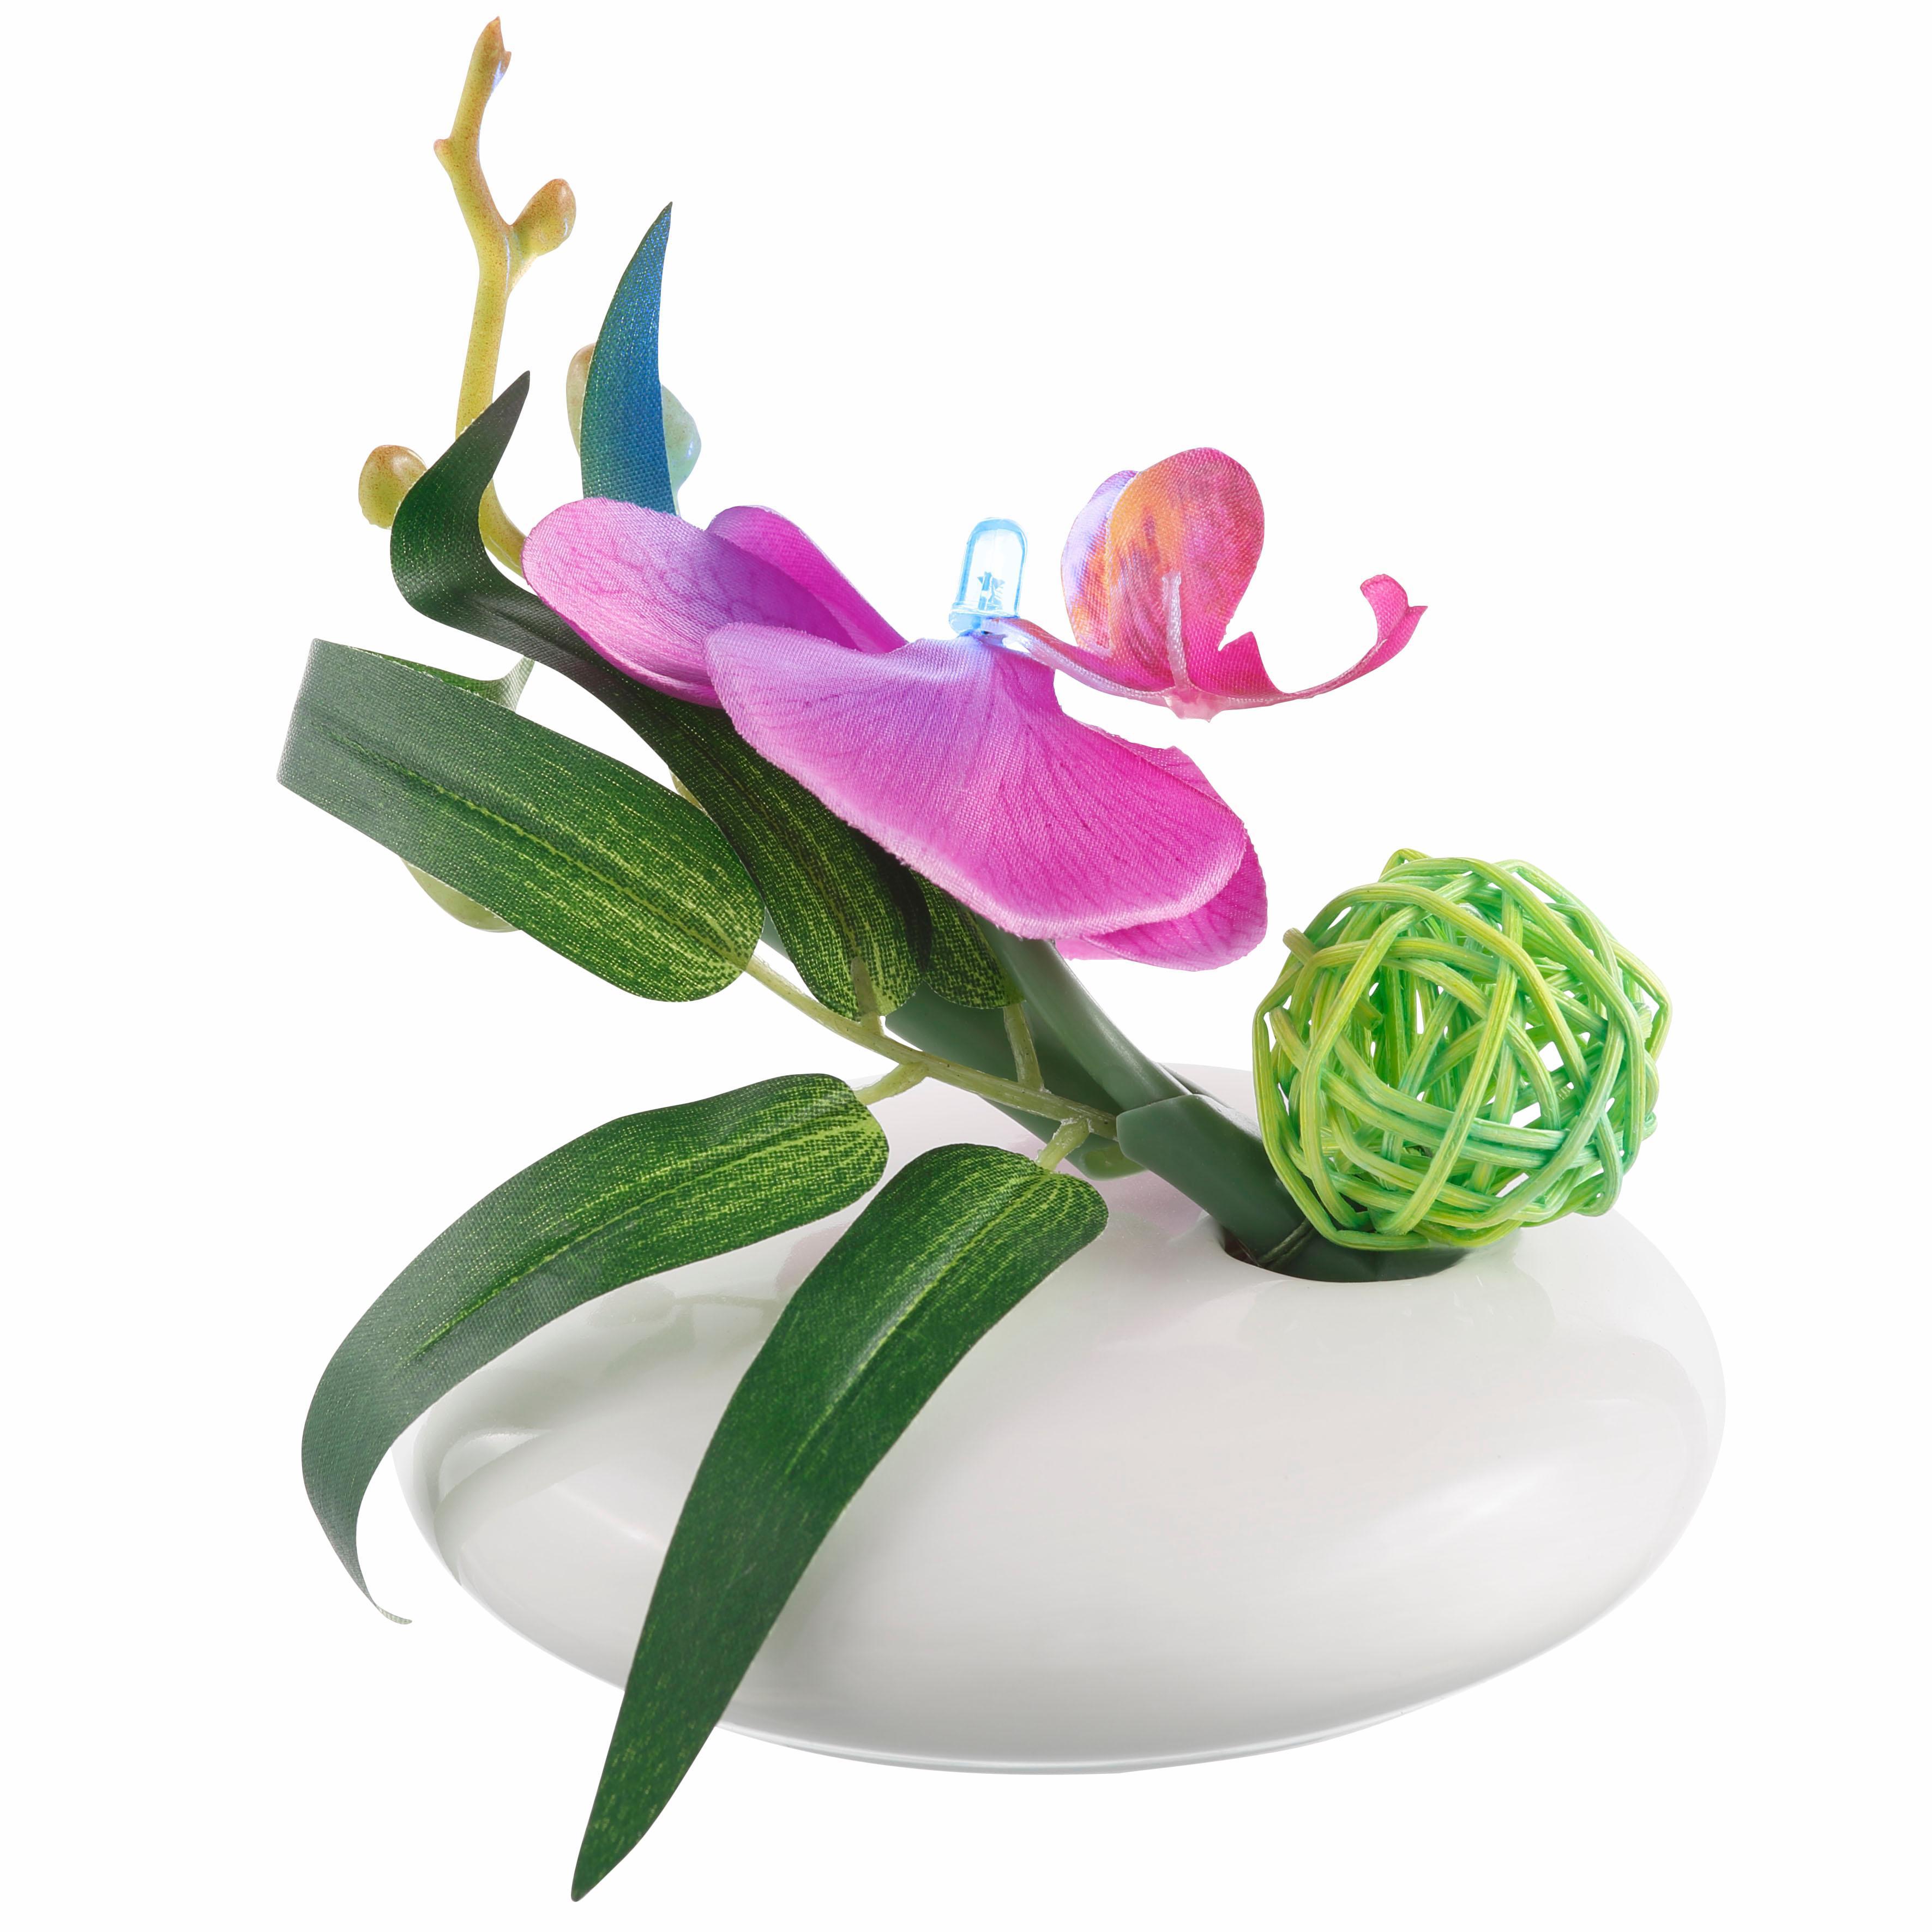 Kunstpflanze-Kunst-Blumen-Kunstpflanzen-Led-Orchidee-2Er-Set Indexbild 4